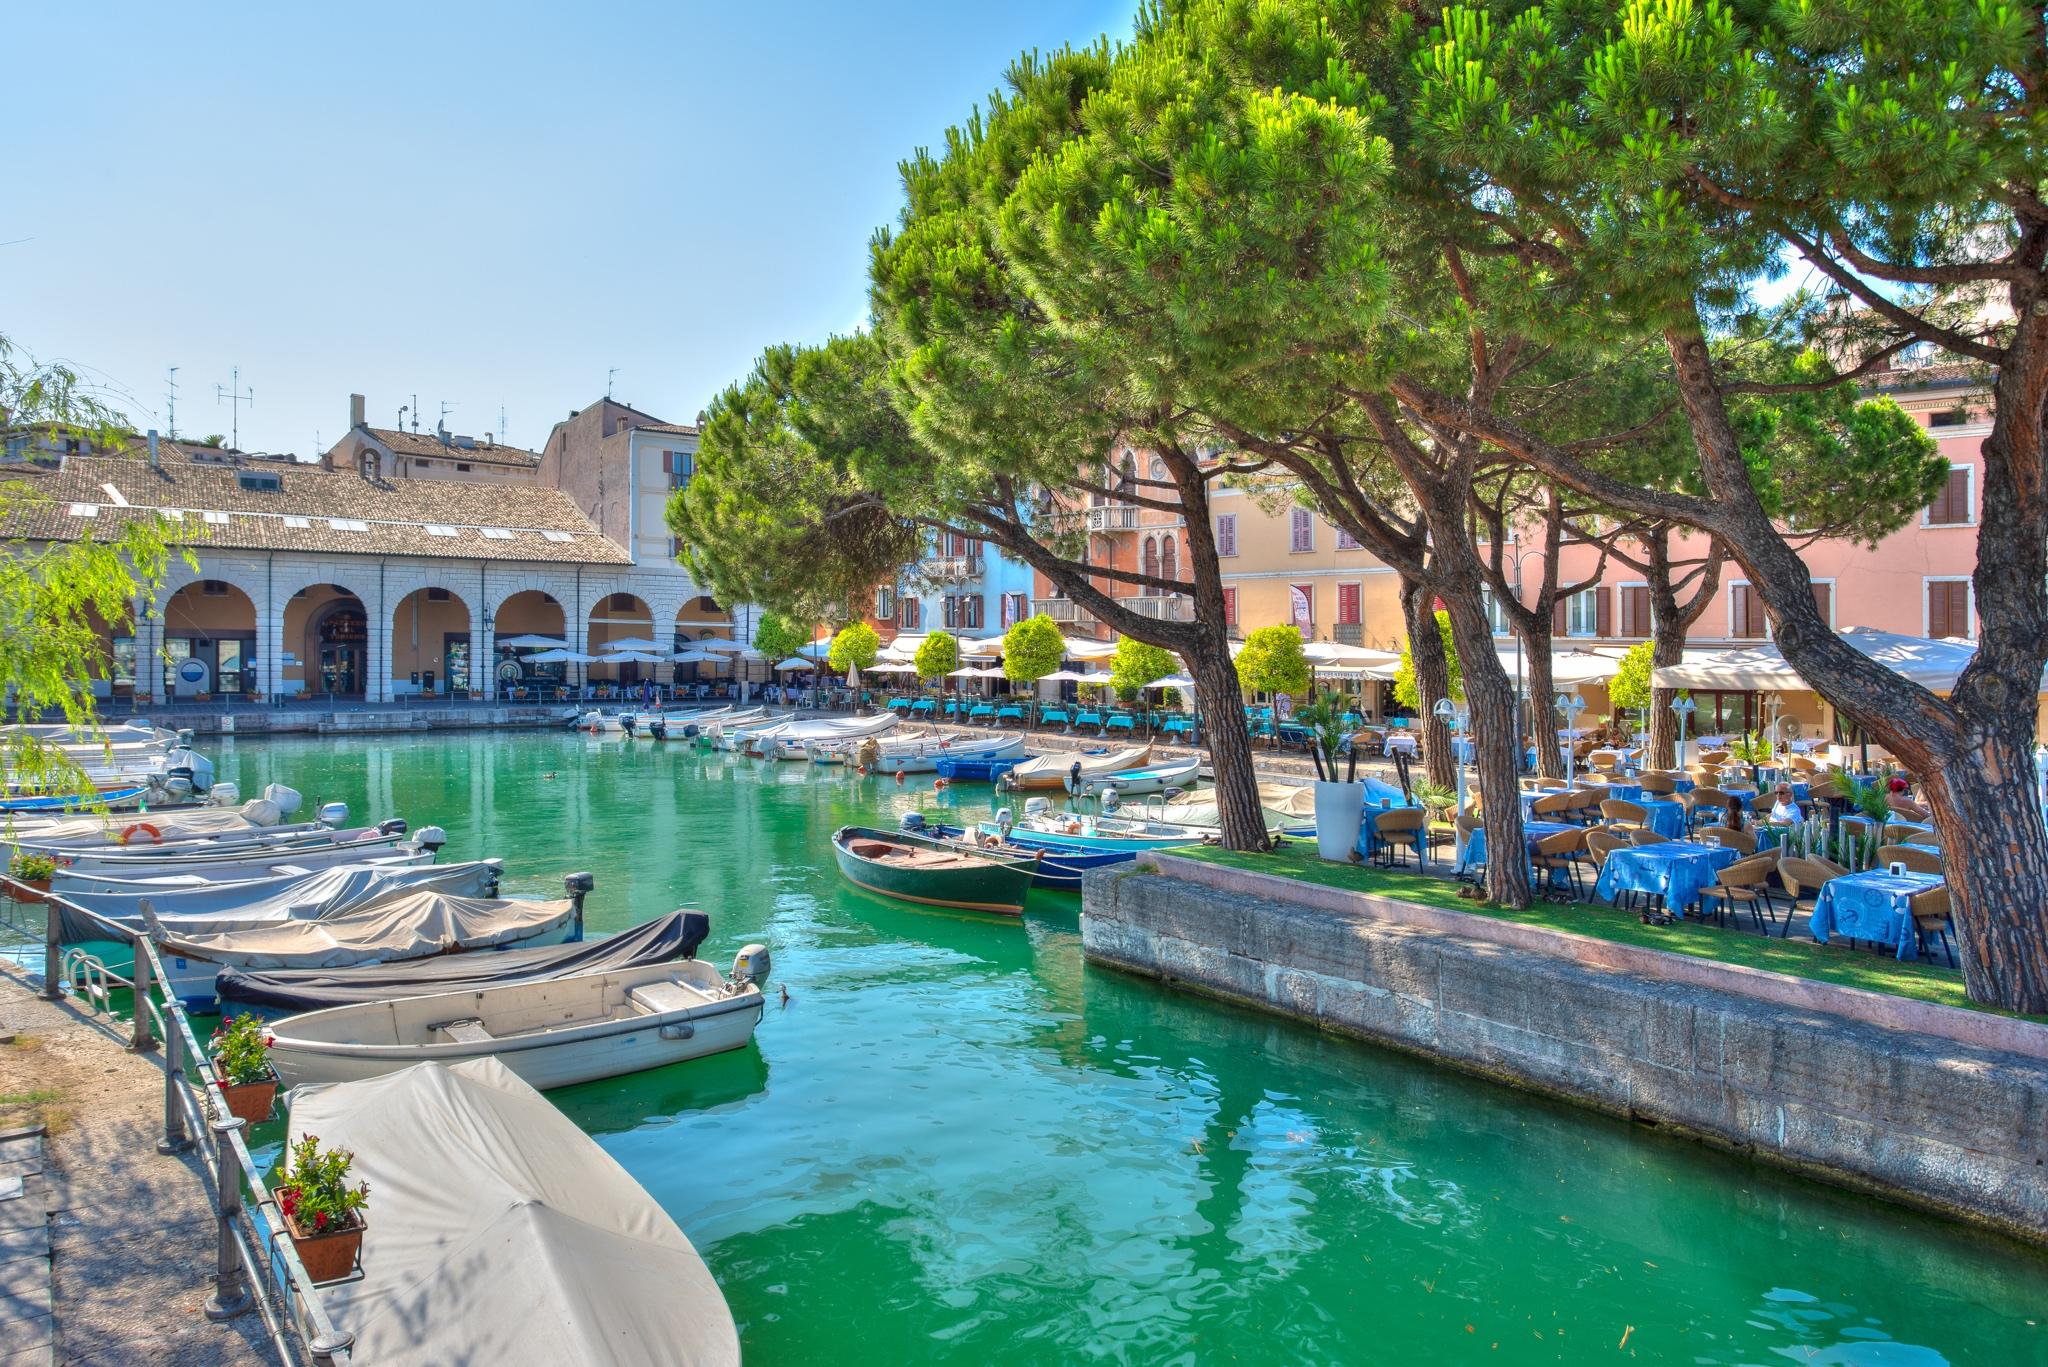 Porto vecchio Desenzano del Garda